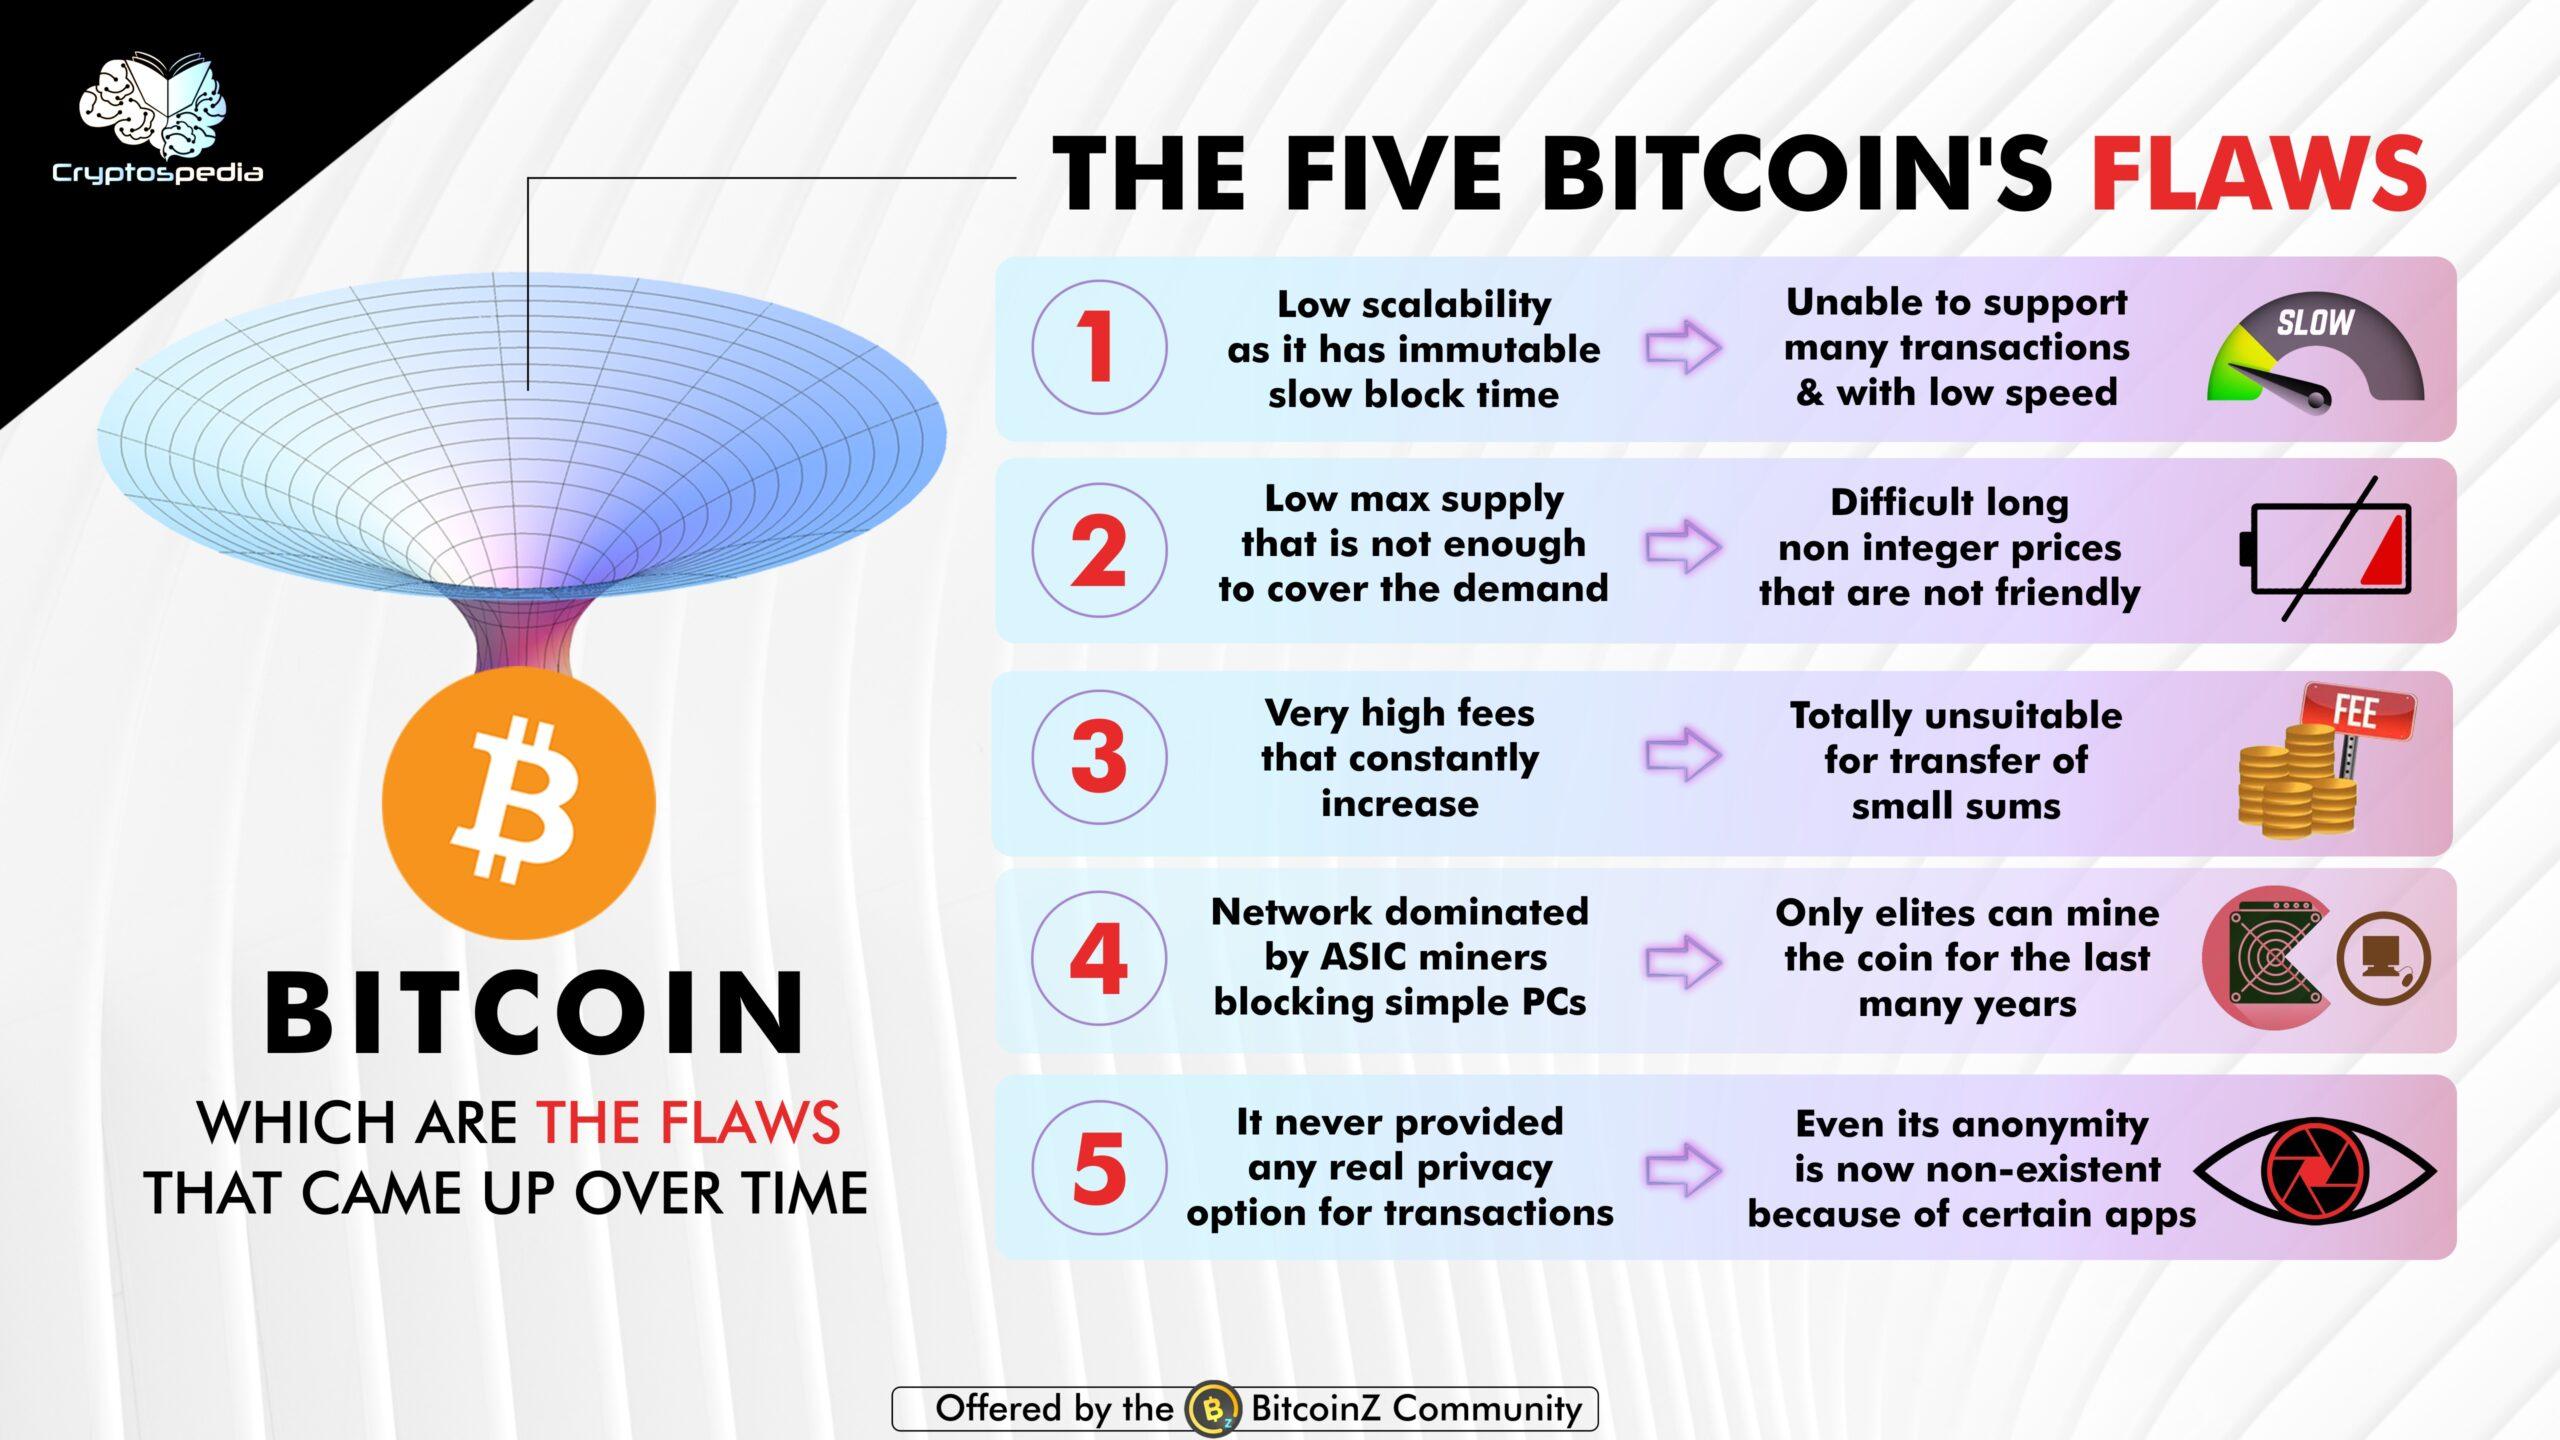 Bitcoin's weaknesses